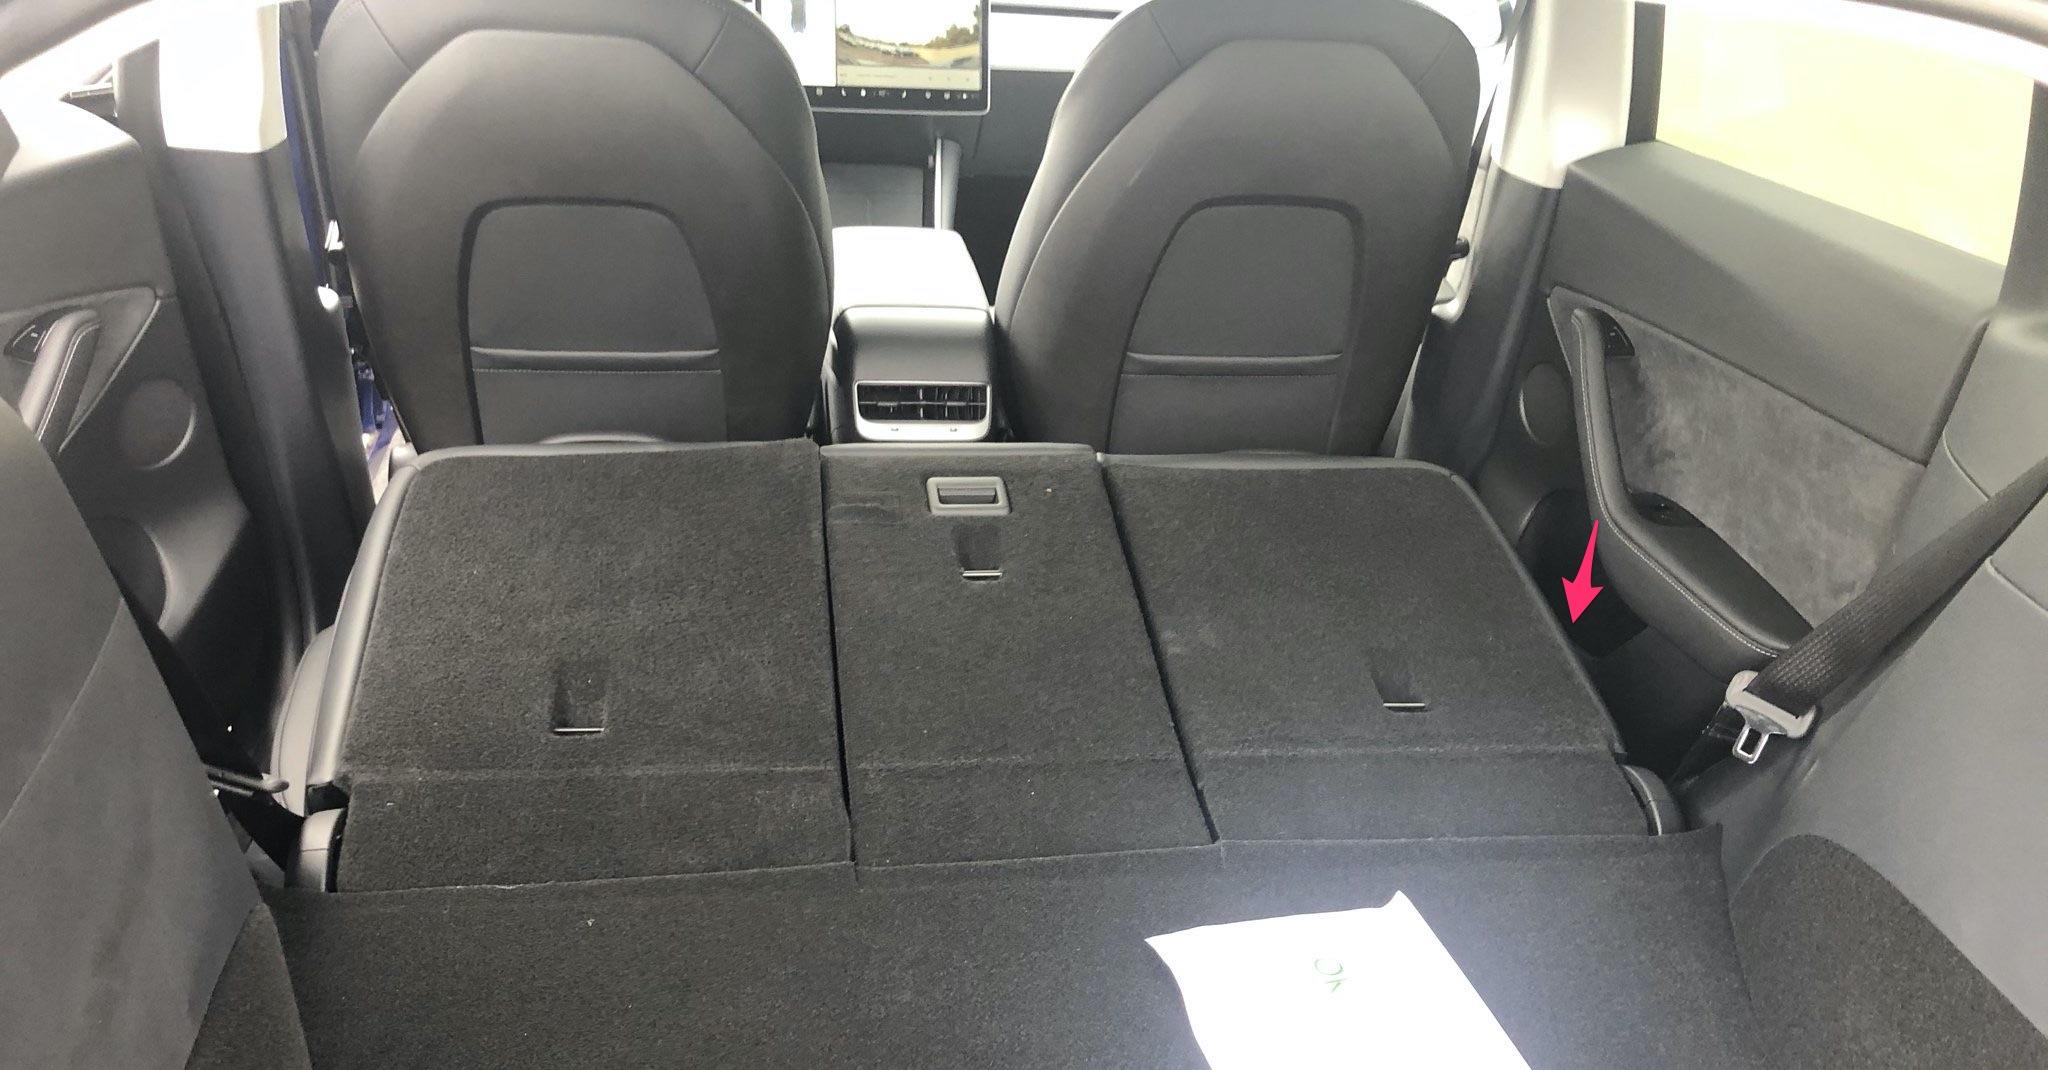 Tesla Model Y rear door emergency release